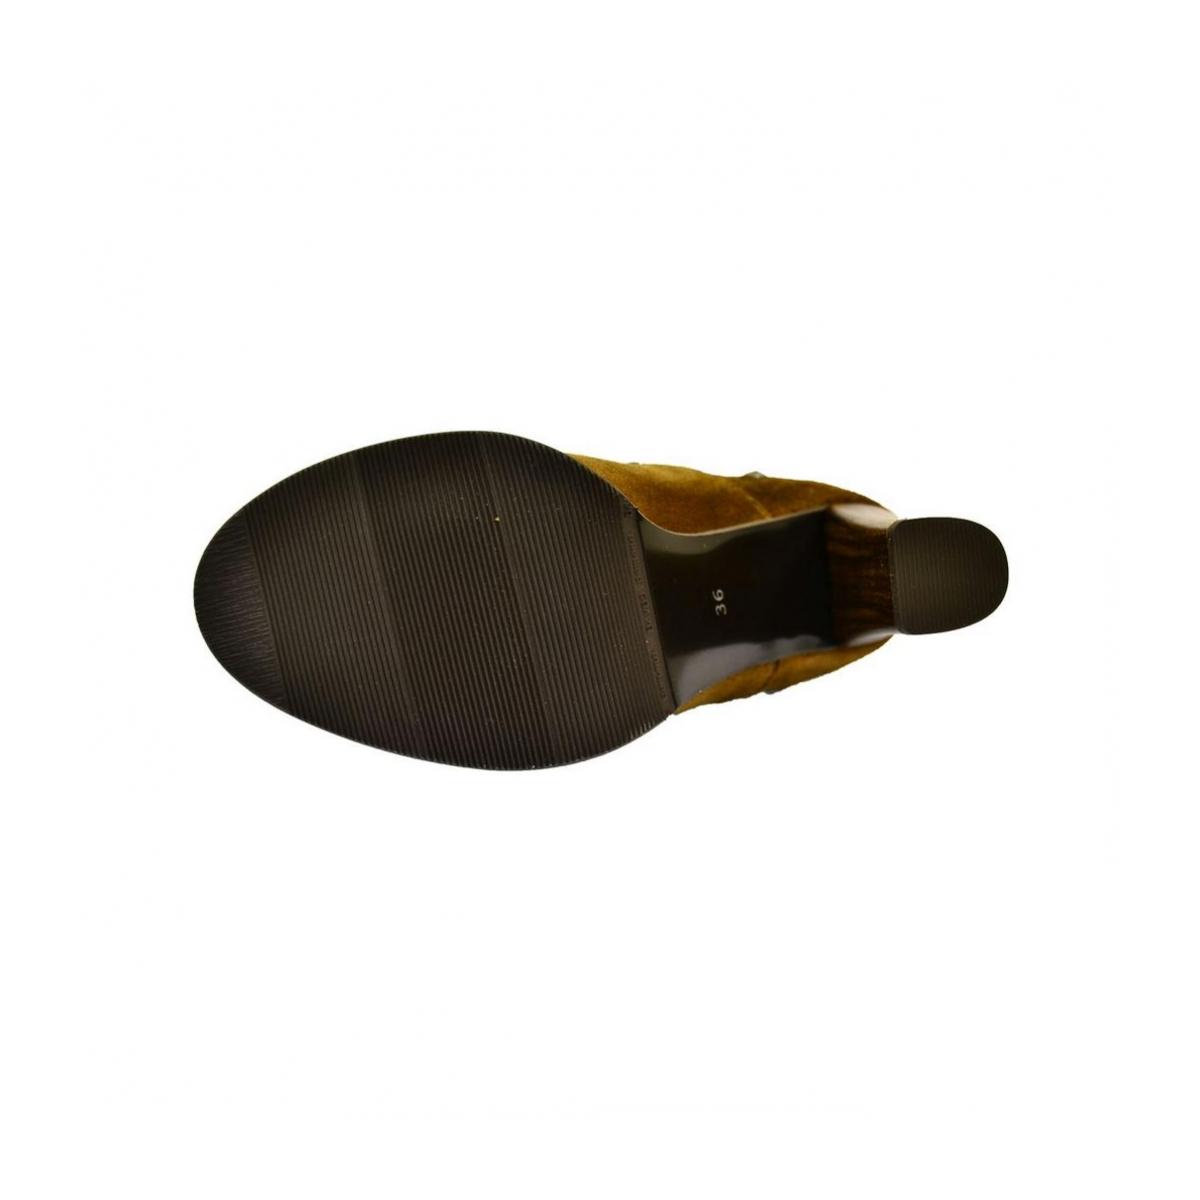 d0a114bbb8376 Dámske hnedé kožené čižmy IVETT - 5